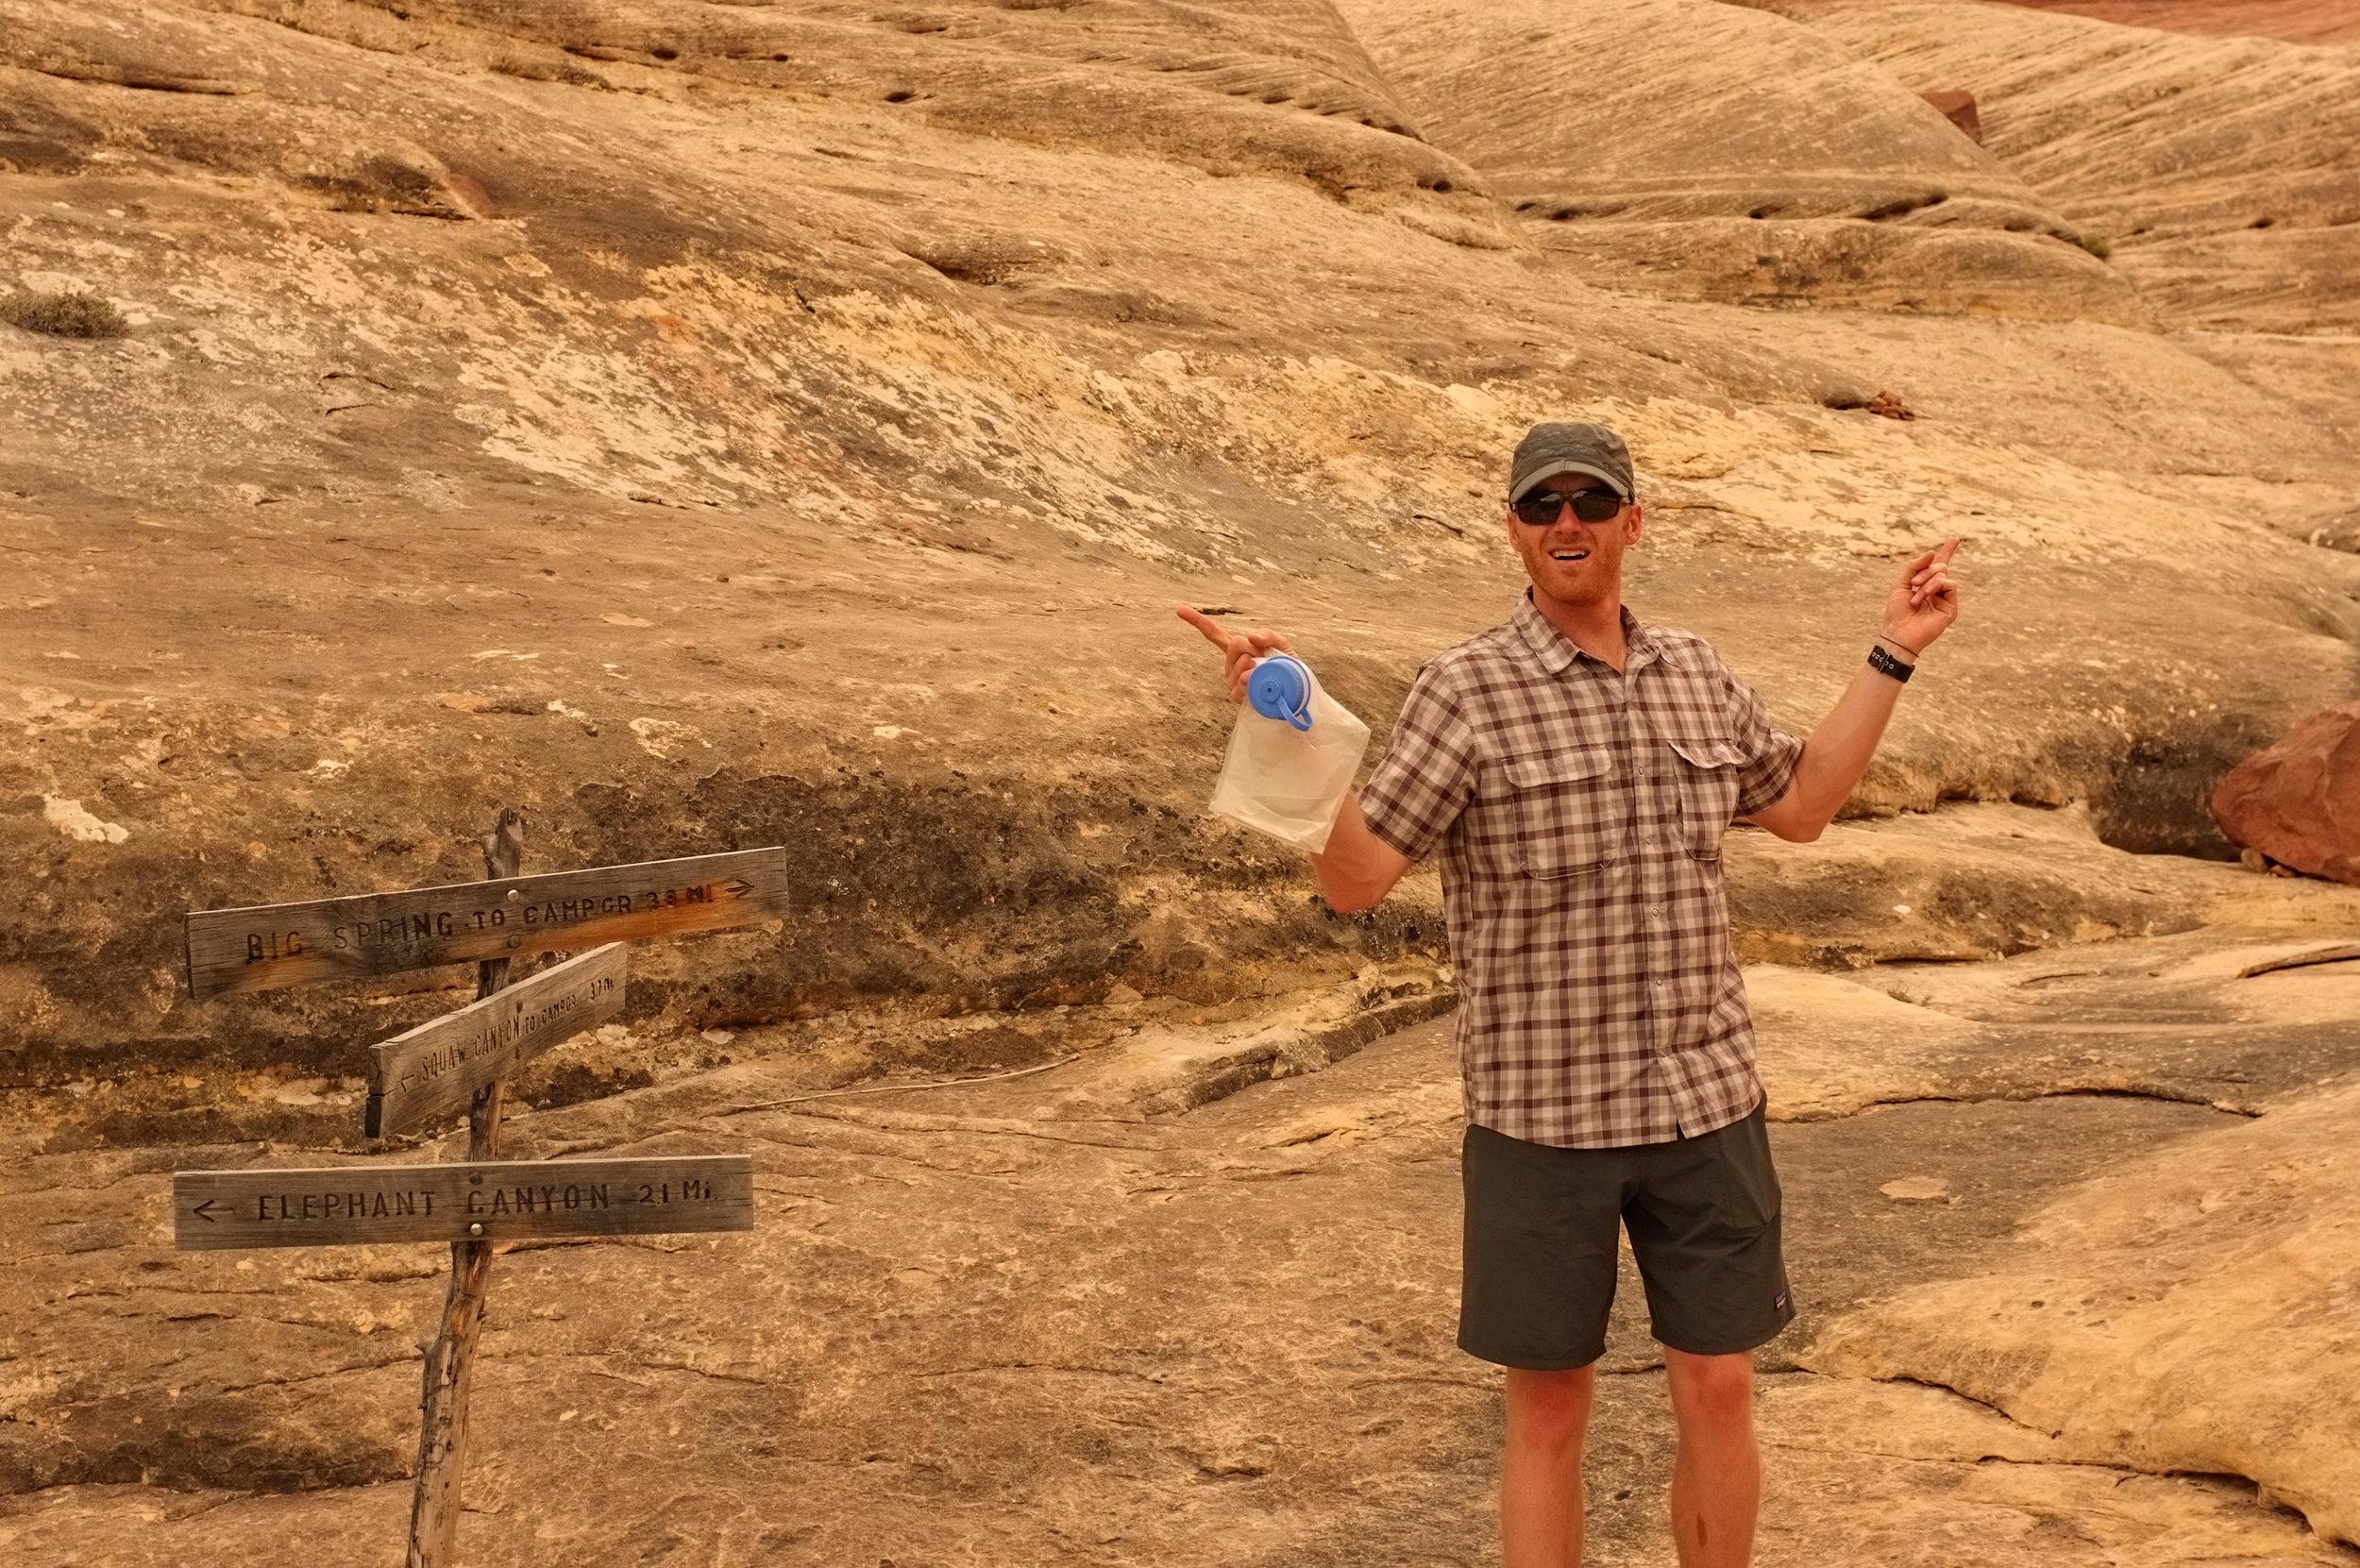 John lost in Canyonlands